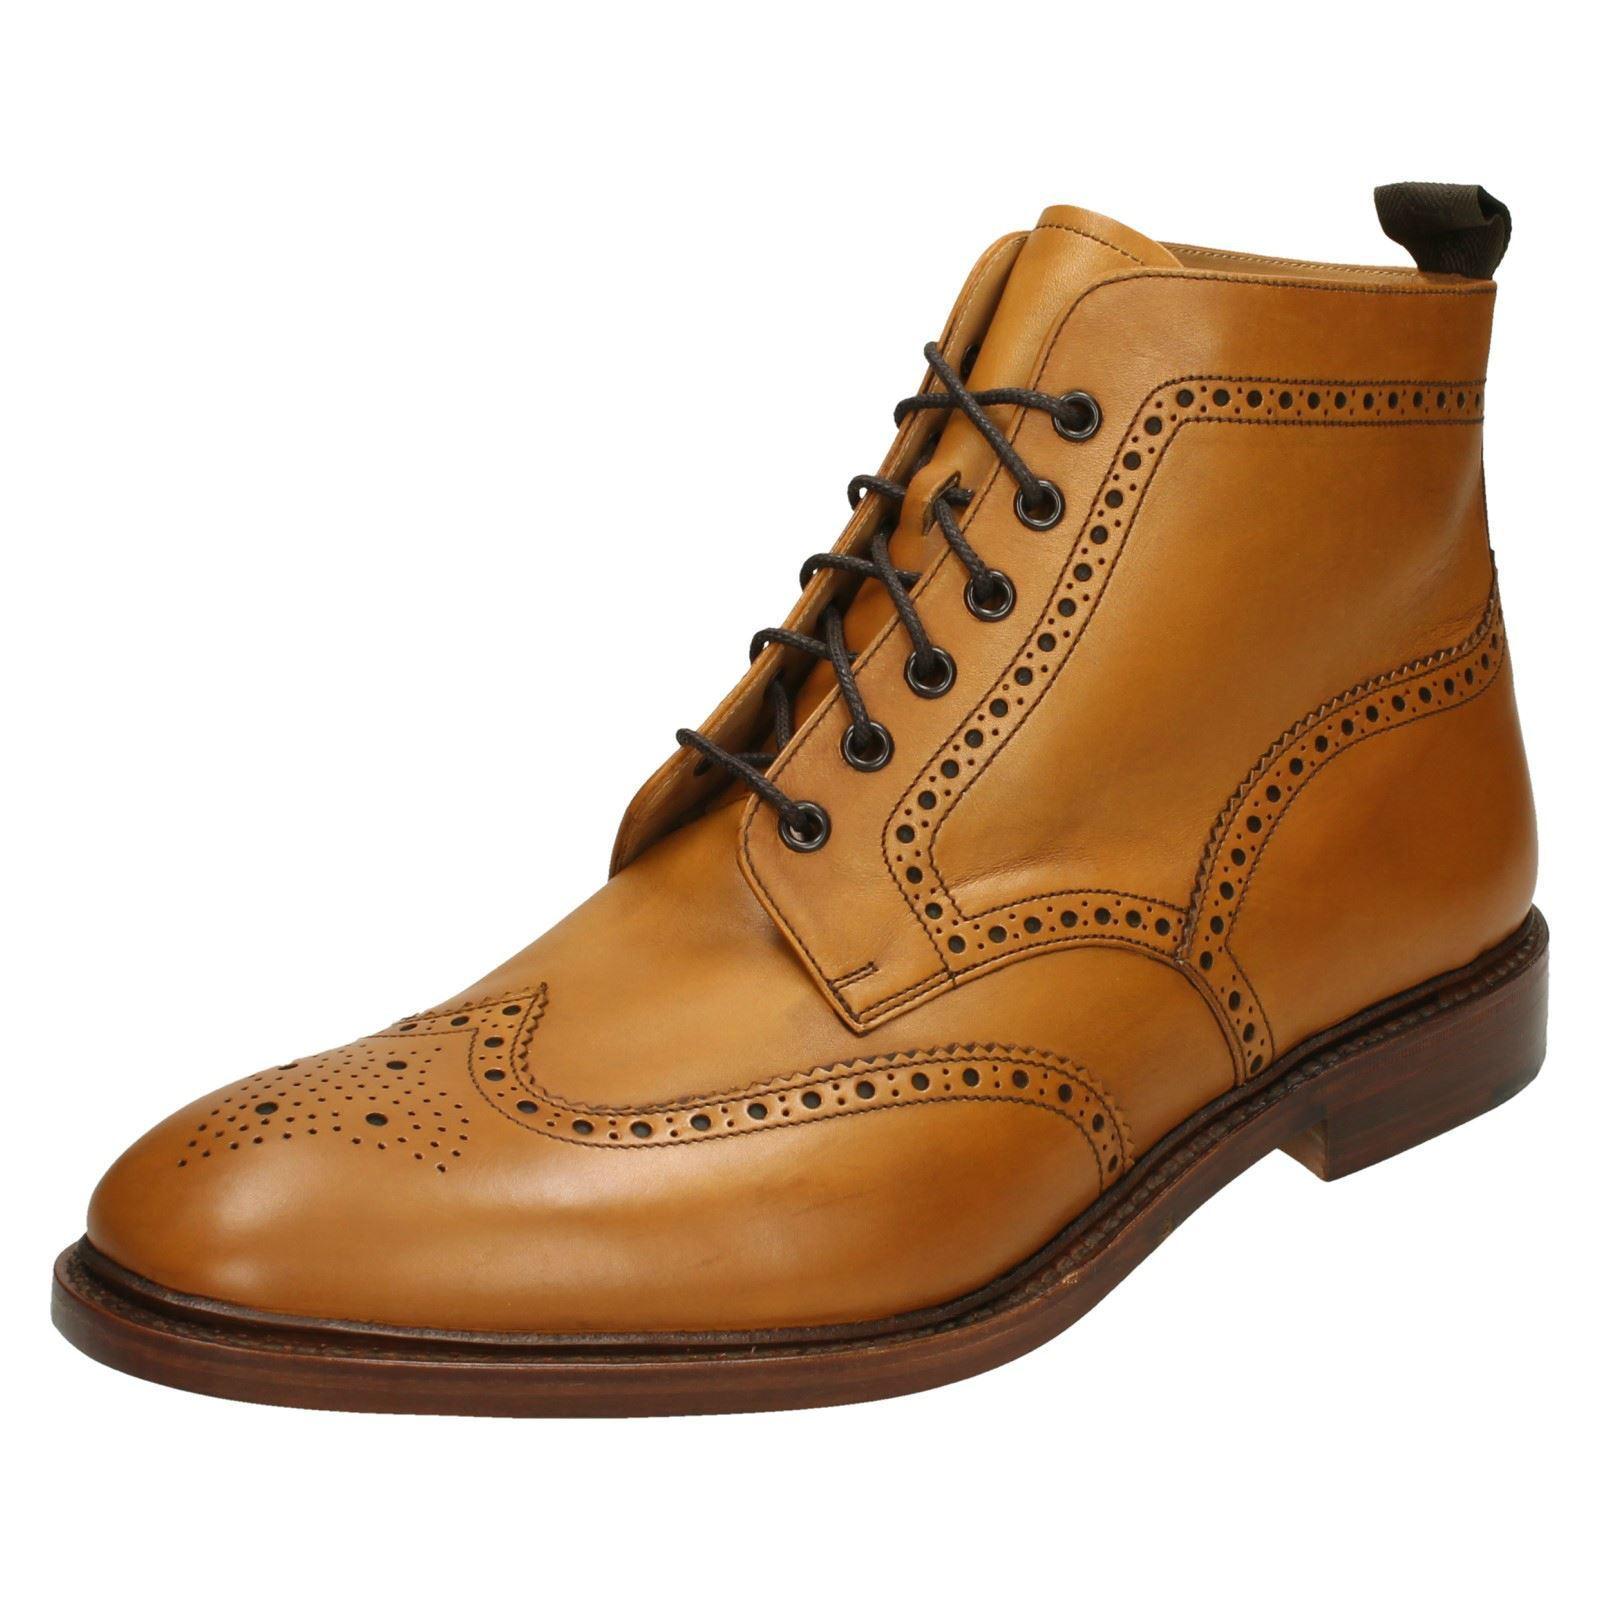 Loake Mens Brogue Lace Up Boots Burford 2